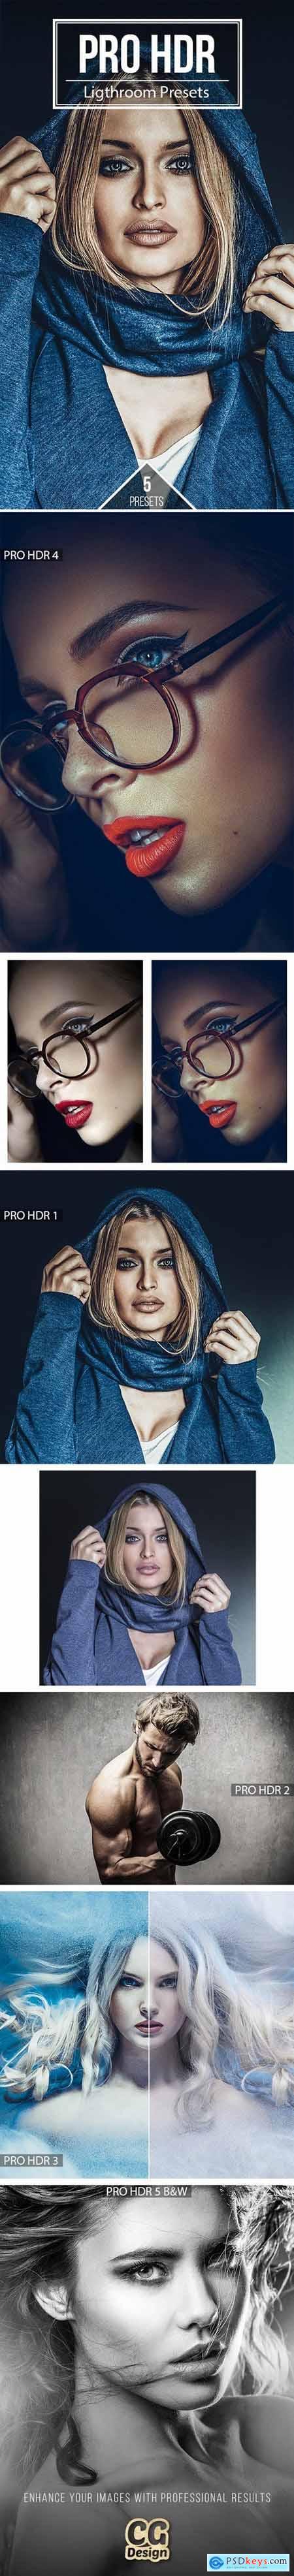 PRO HDR - 5 Premium Lightroom Presets 21223492